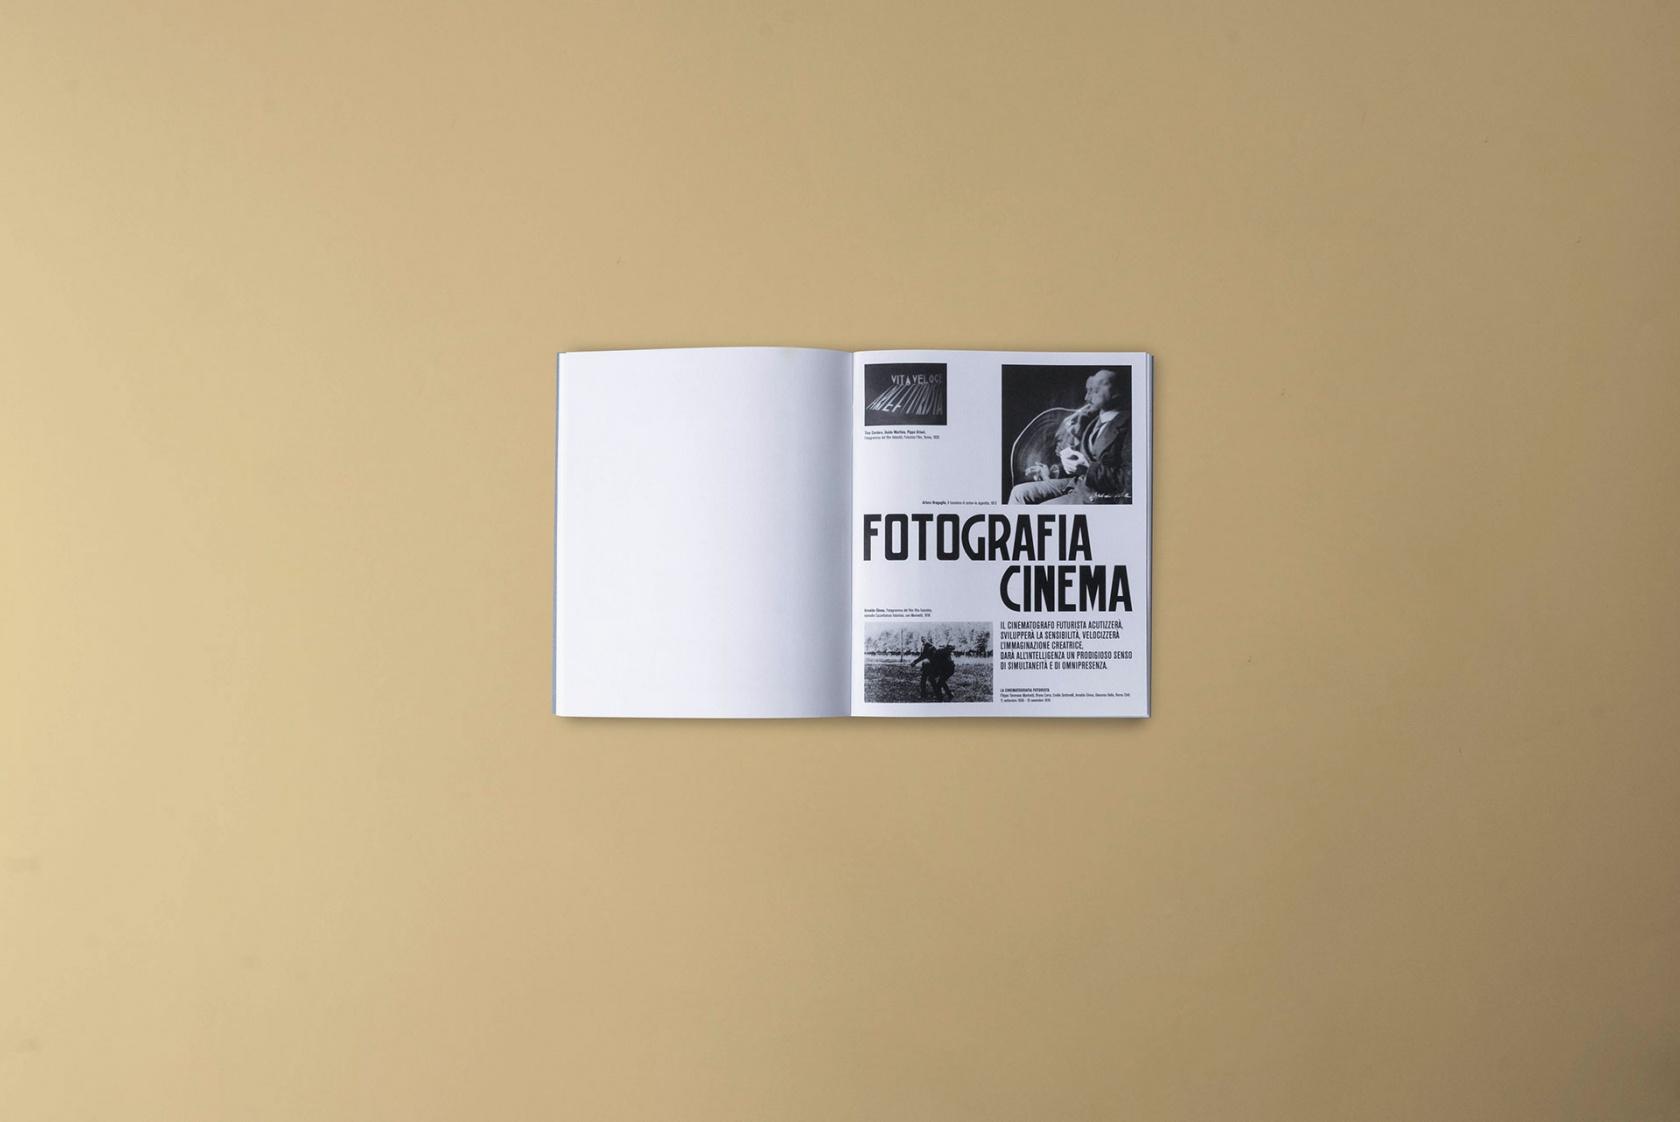 quaderno futurista fotografia cinema lr 1680x1122 q95